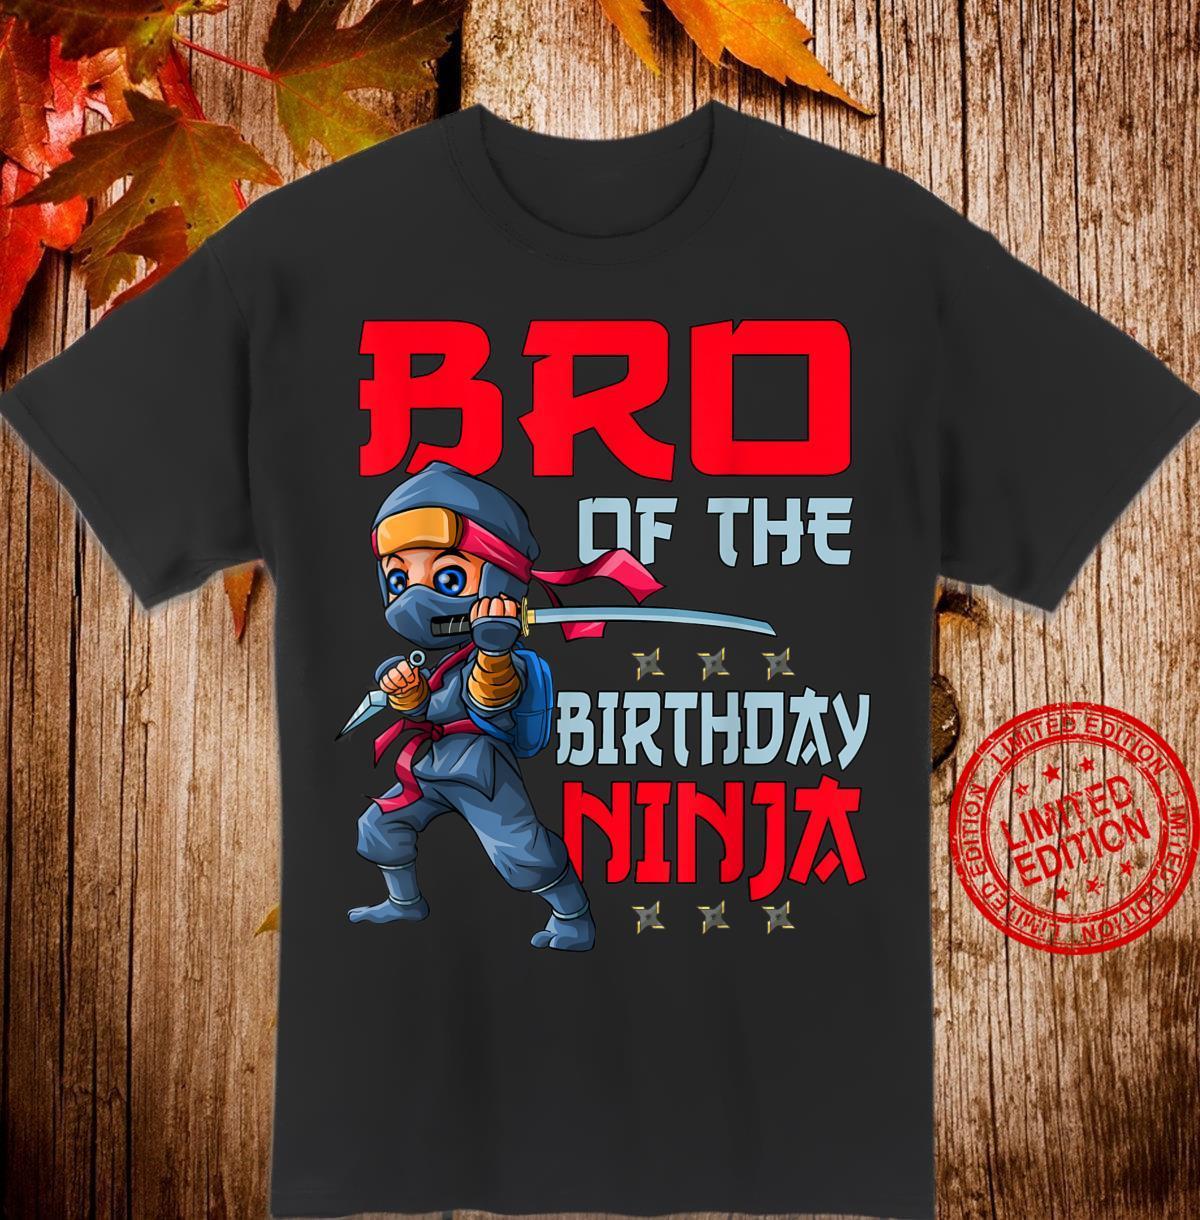 Bruder des Geburtstags Ninja Bday Boy Family Matching Shirt